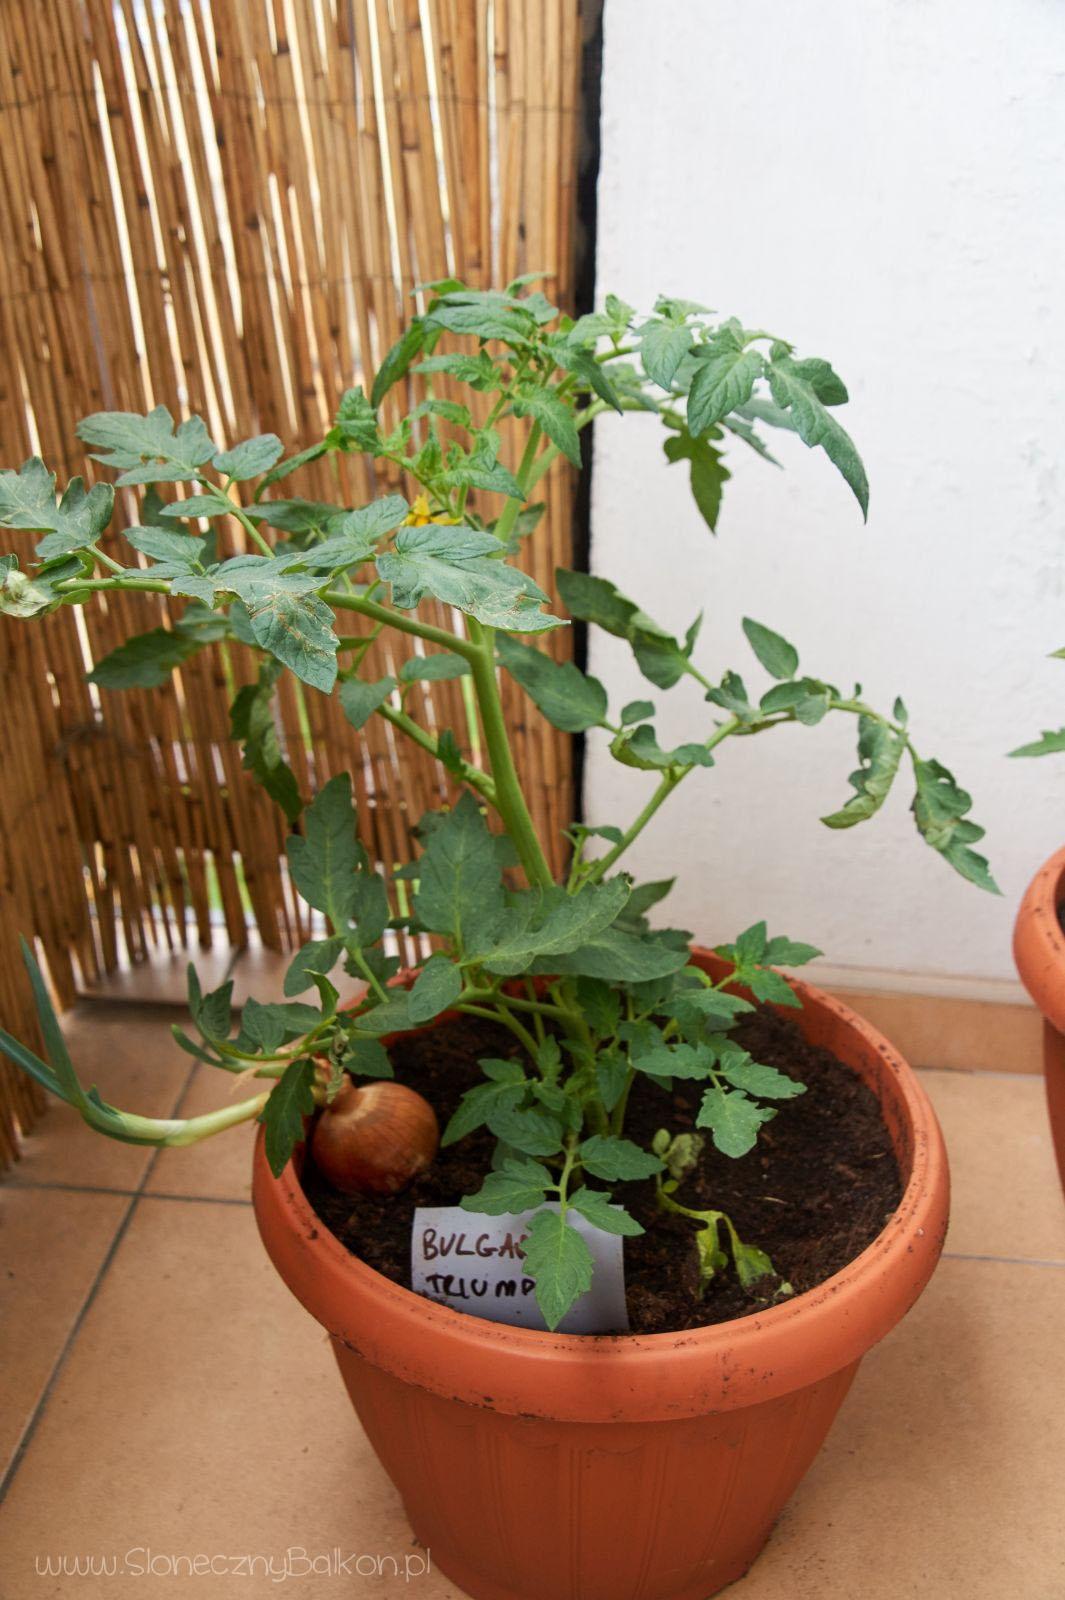 2016-05-29_pomidor-bulgarian-triumph